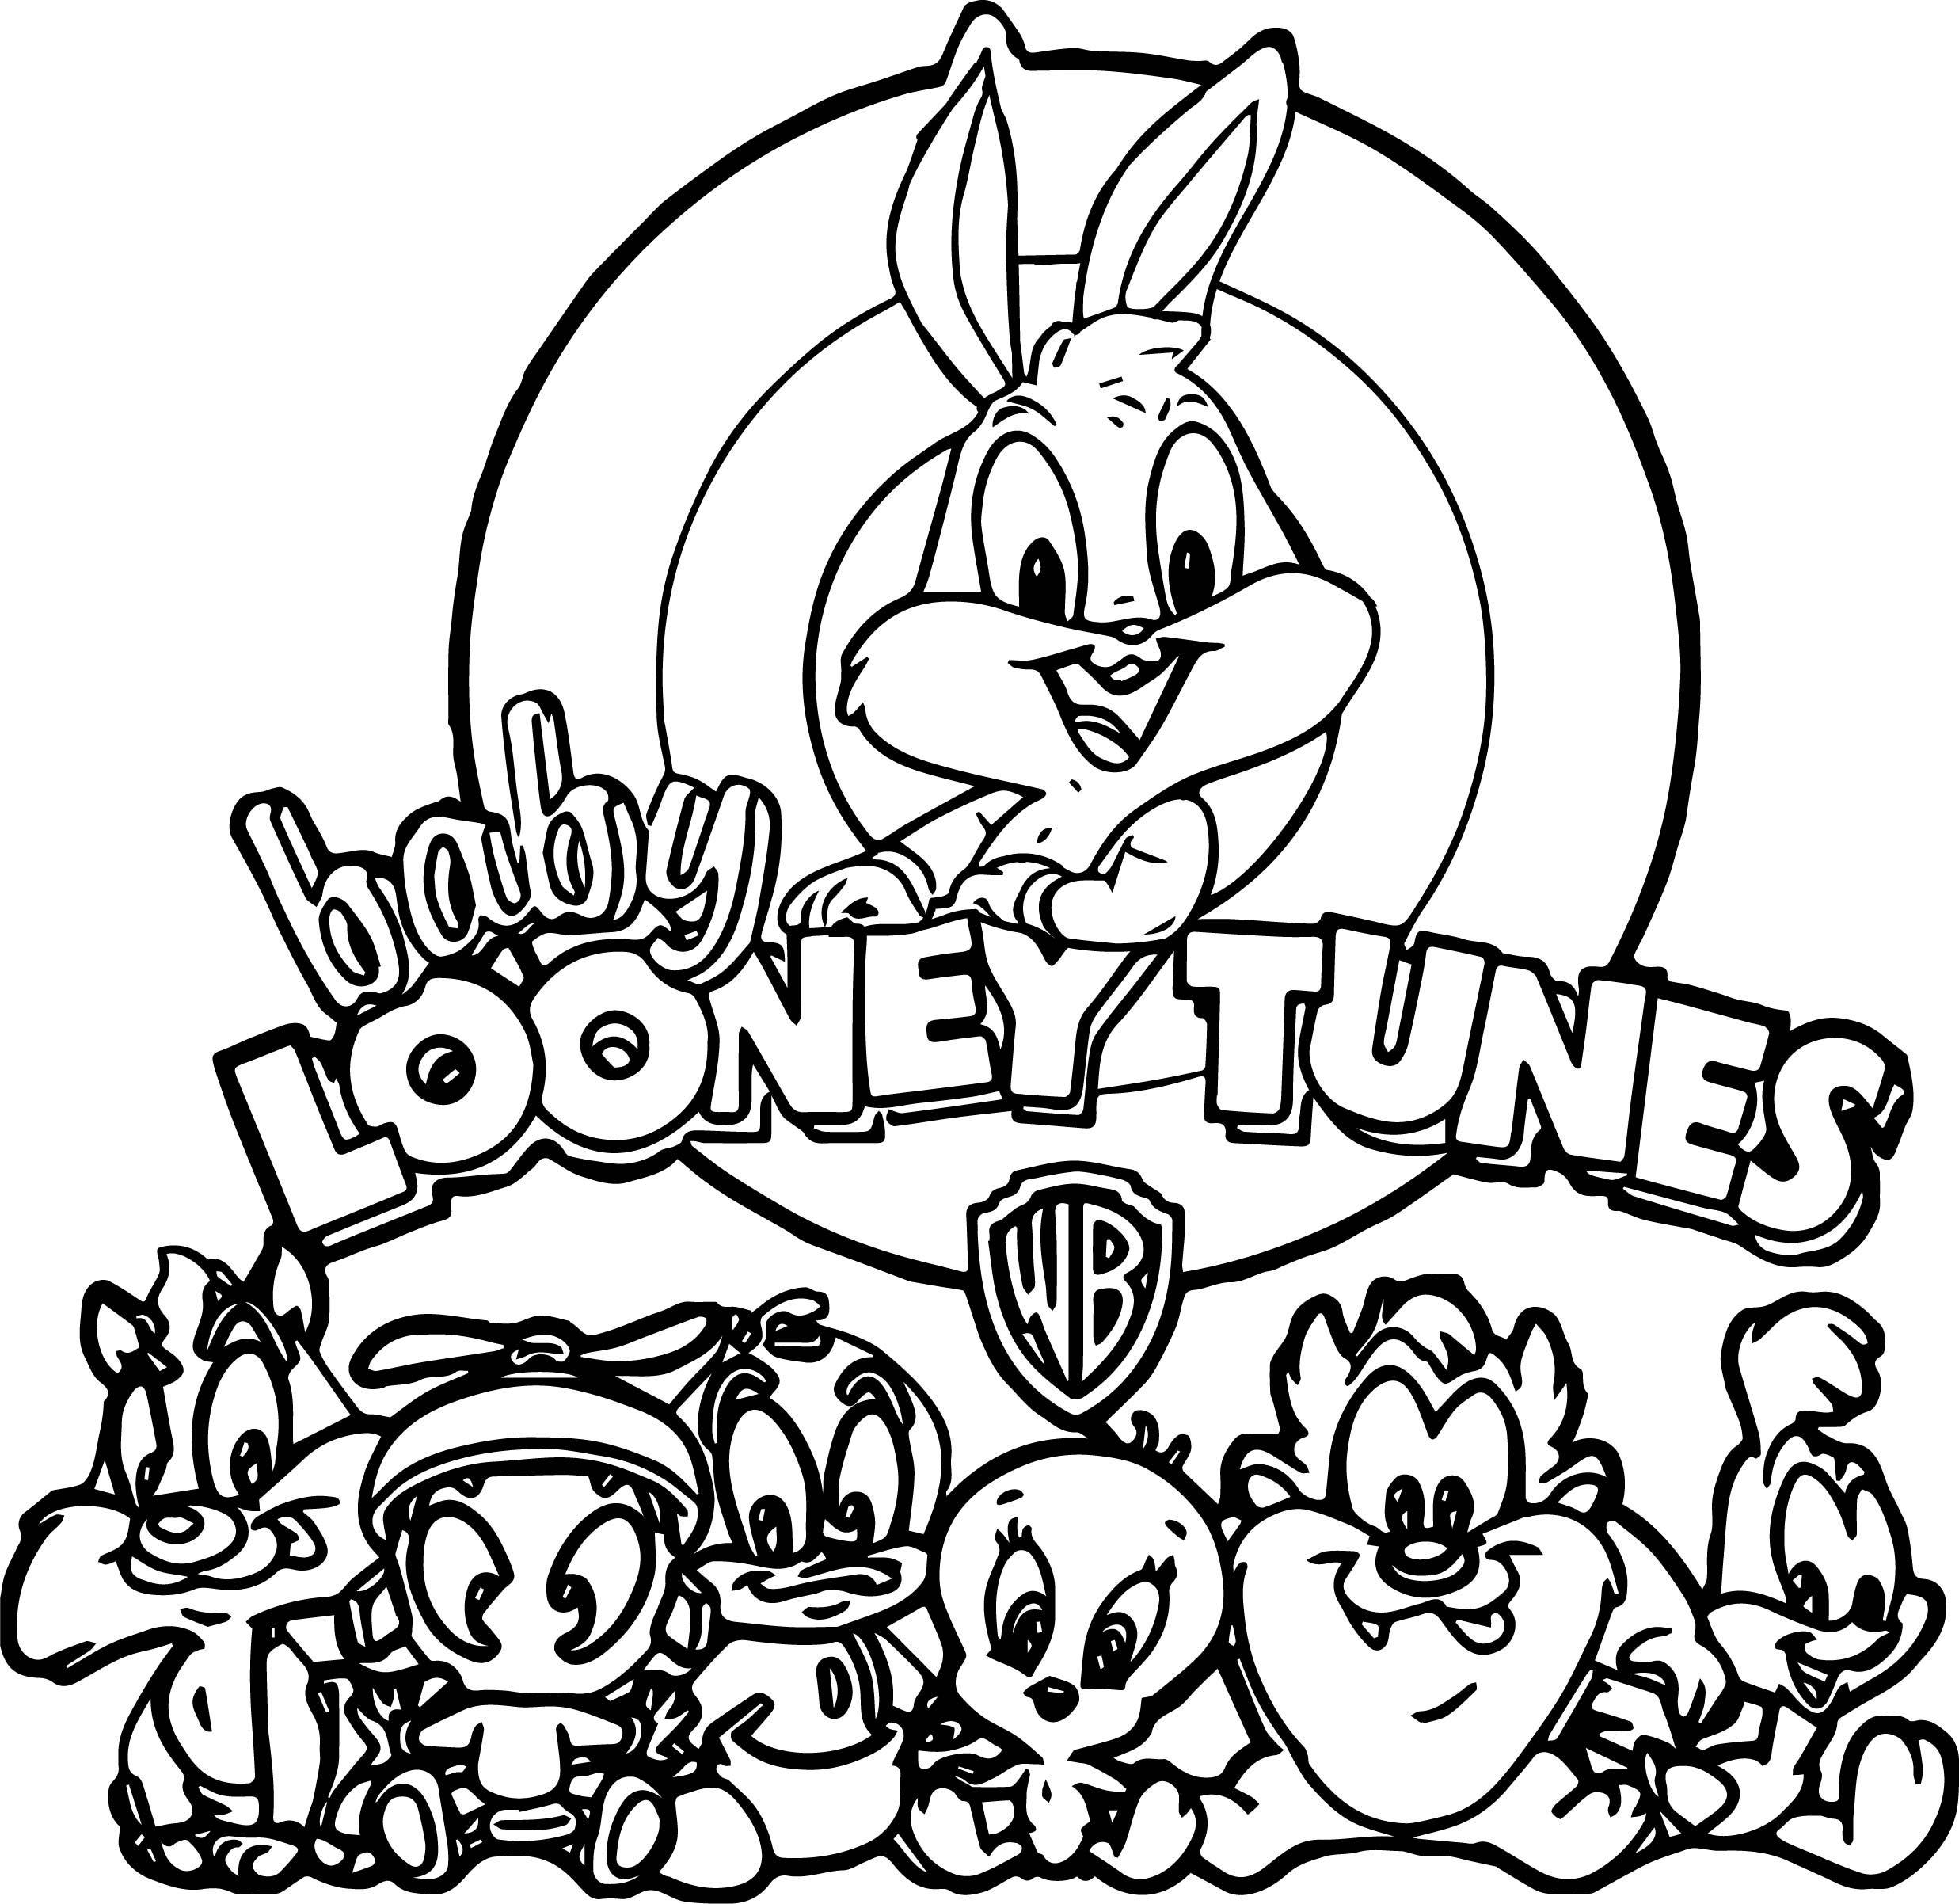 Warner Bros Baby Looney Tunes All Coloring Page  Baby looney